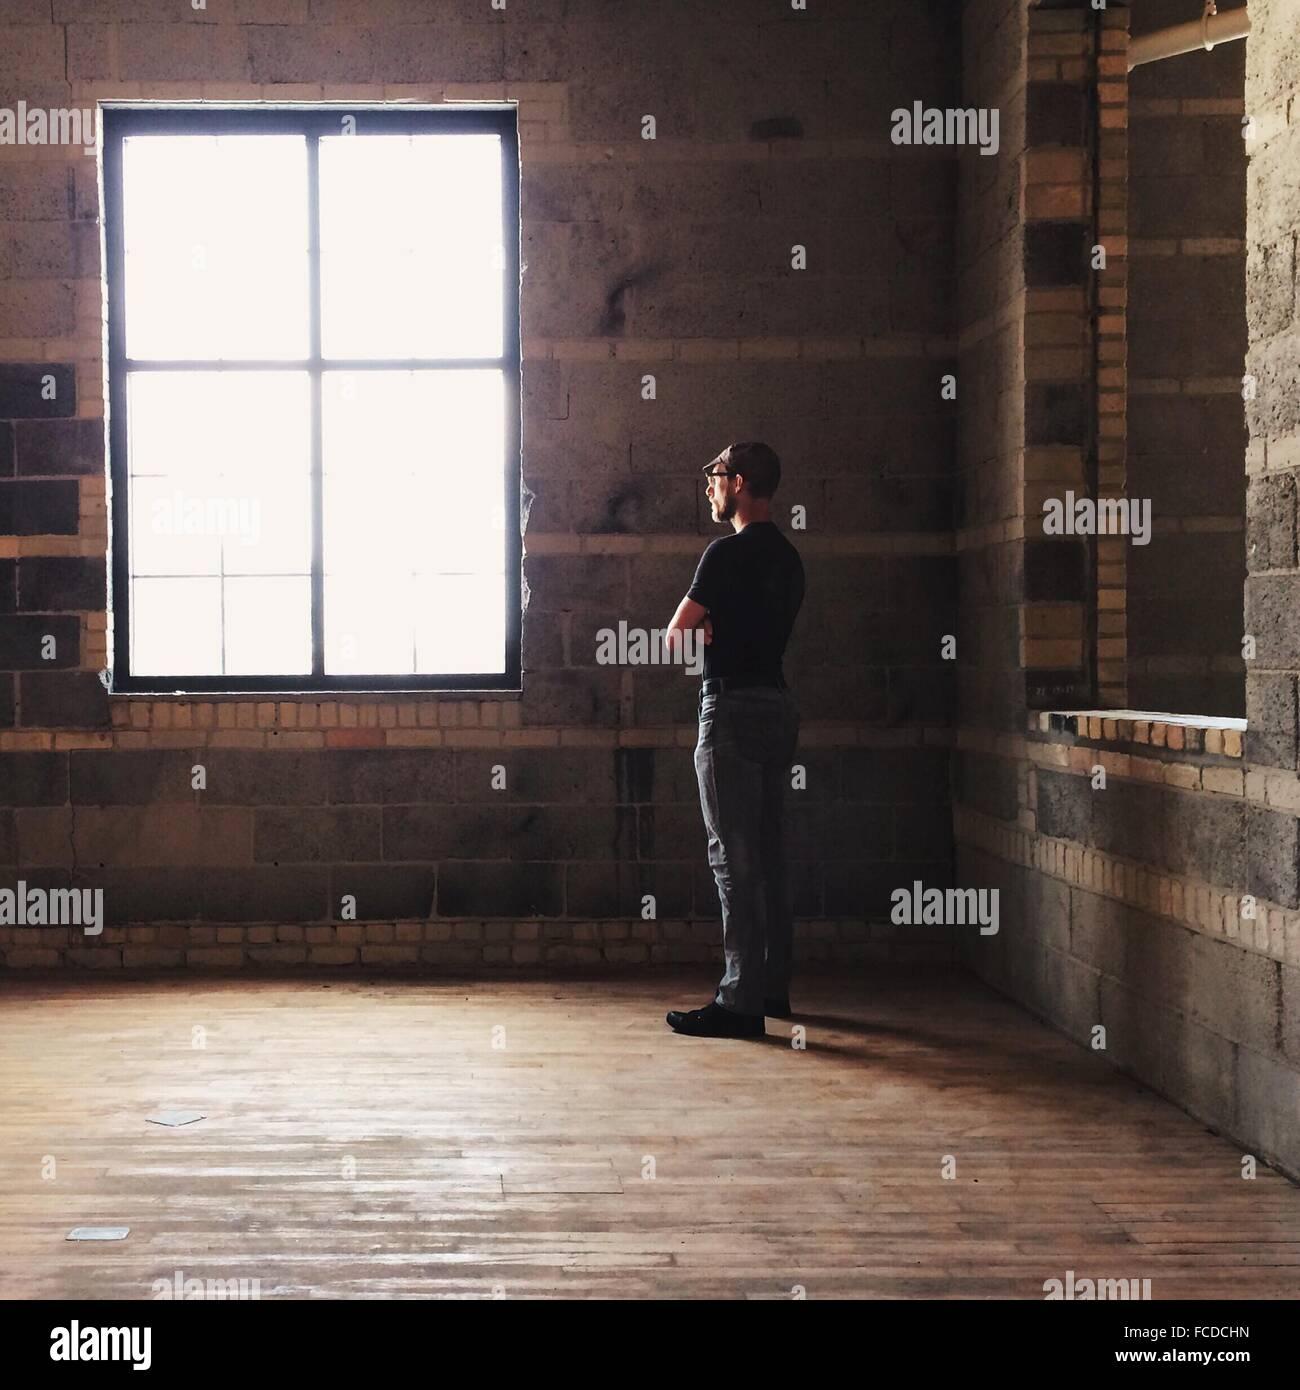 El perfil lateral de un hombre mirando hacia afuera de la ventana Foto de stock